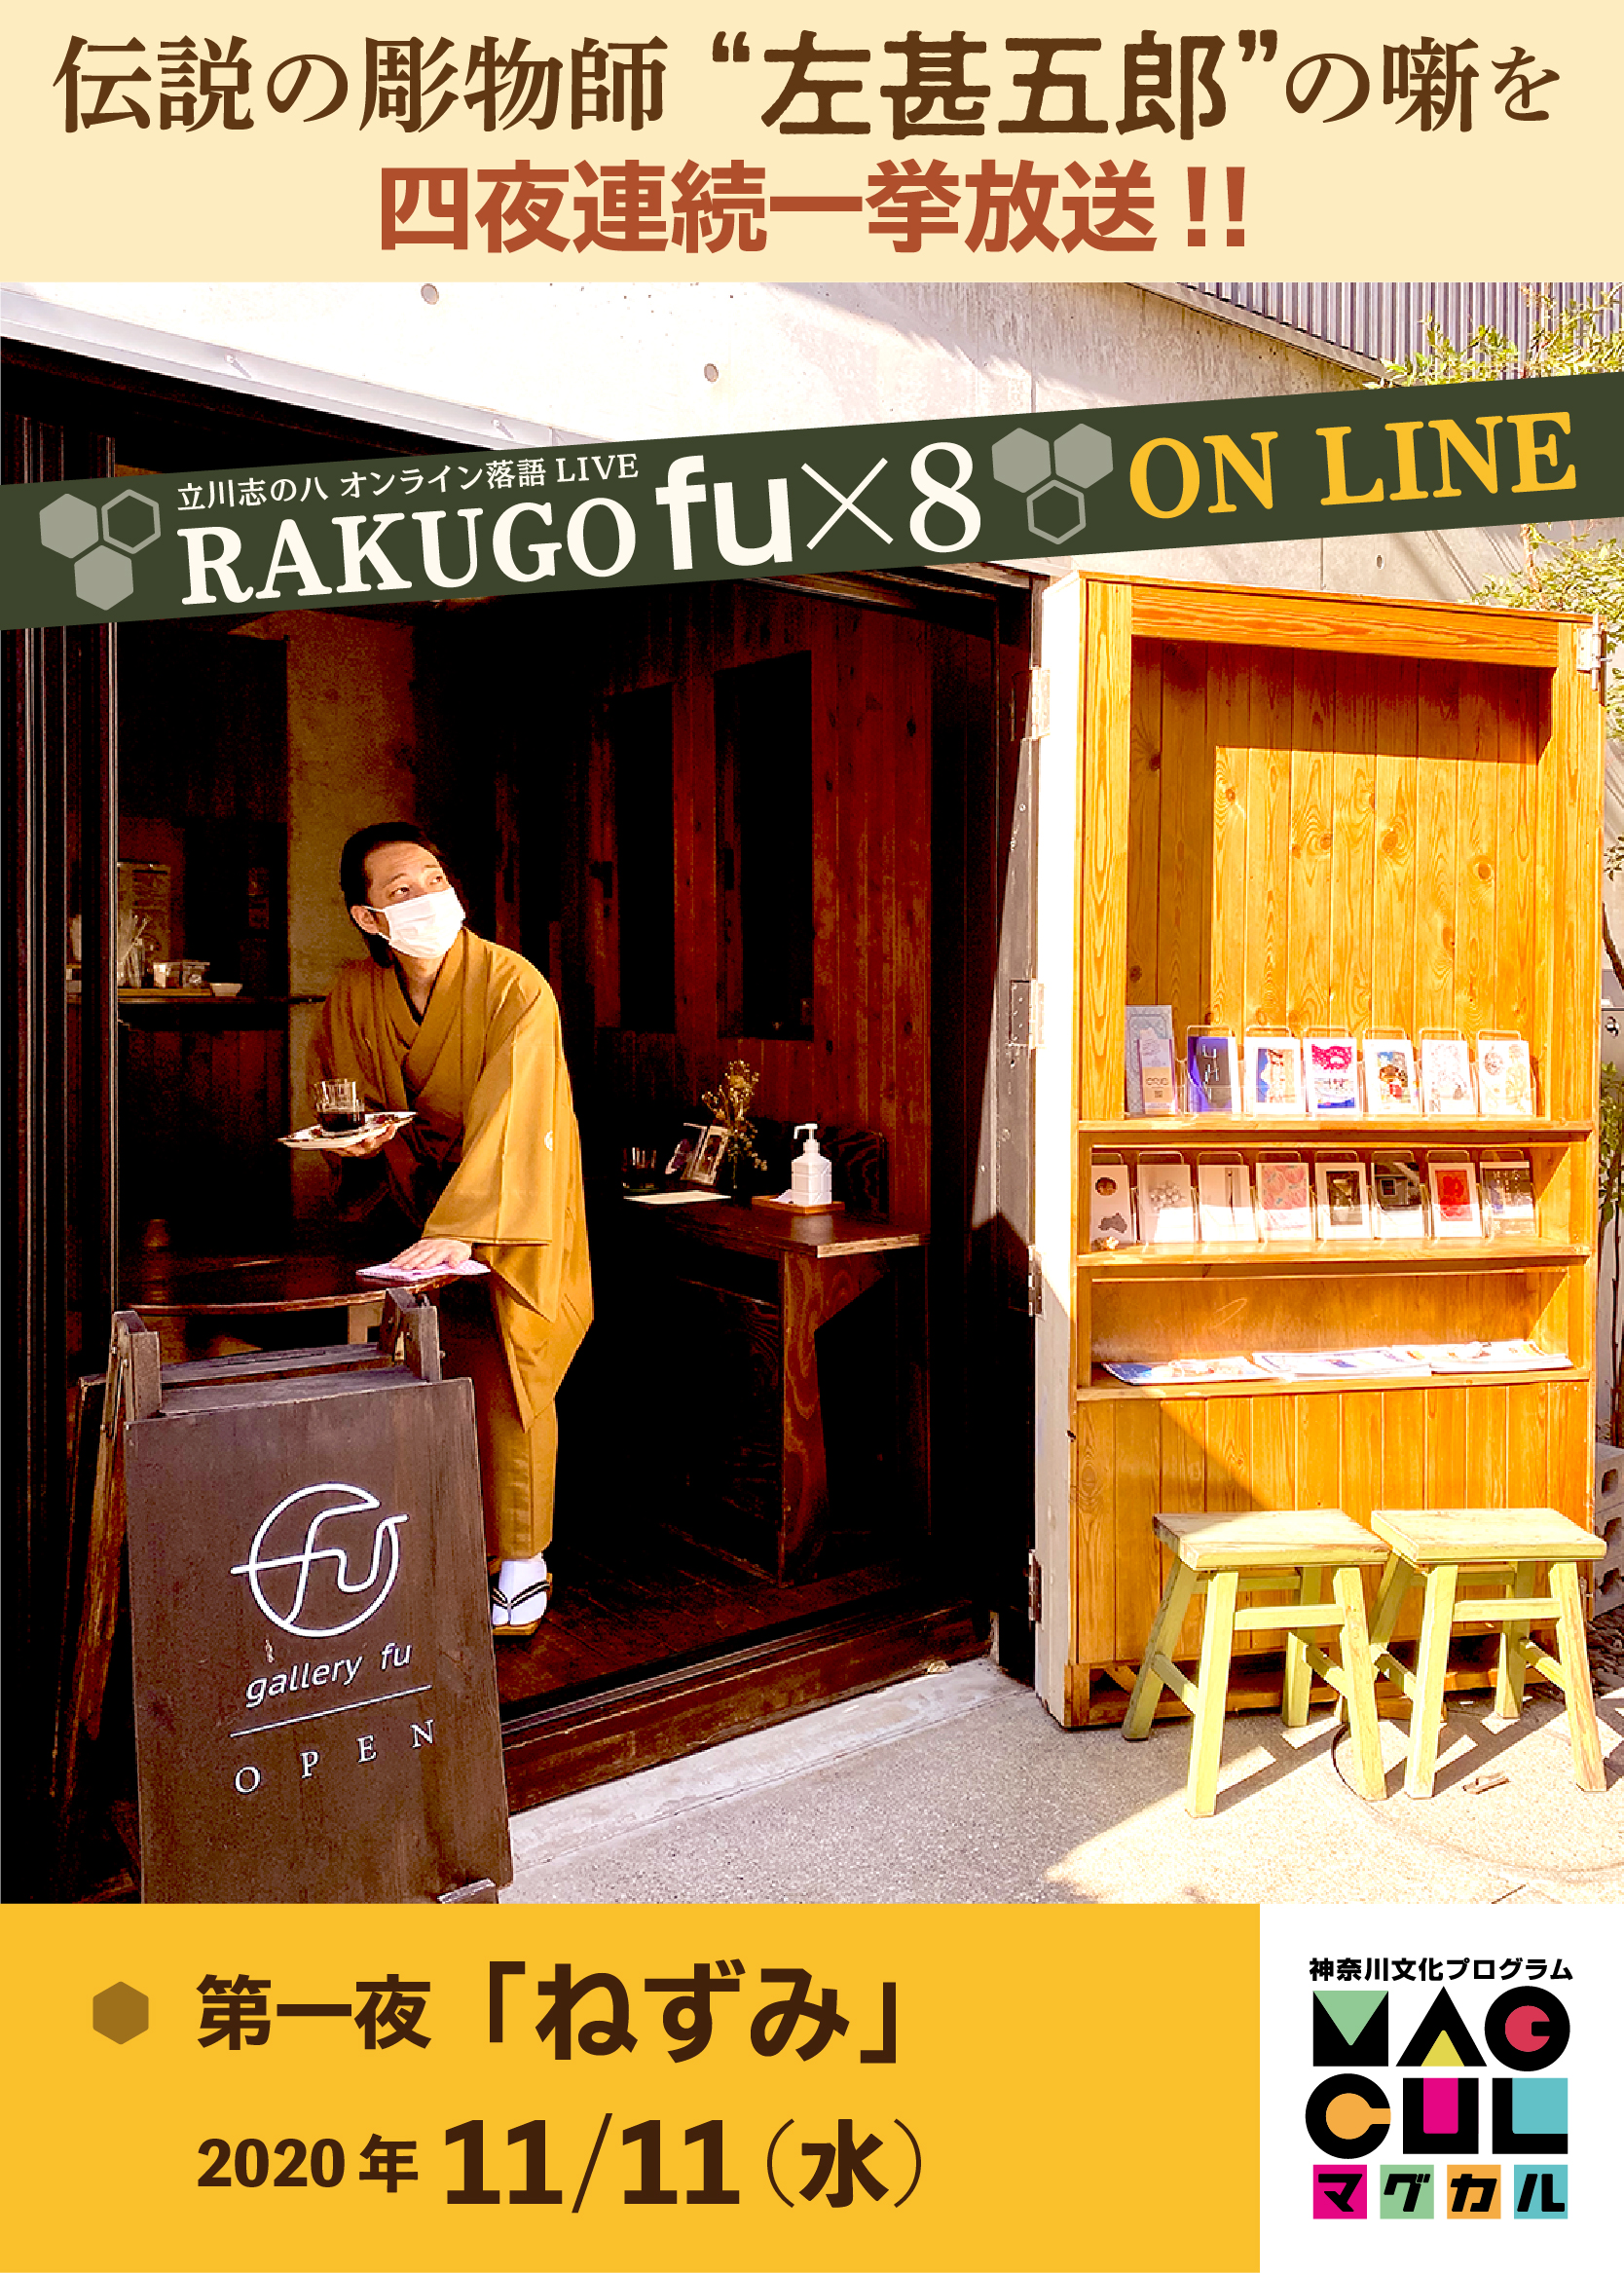 RAKUGO fu×8 ONLINE 第一夜「ねずみ」